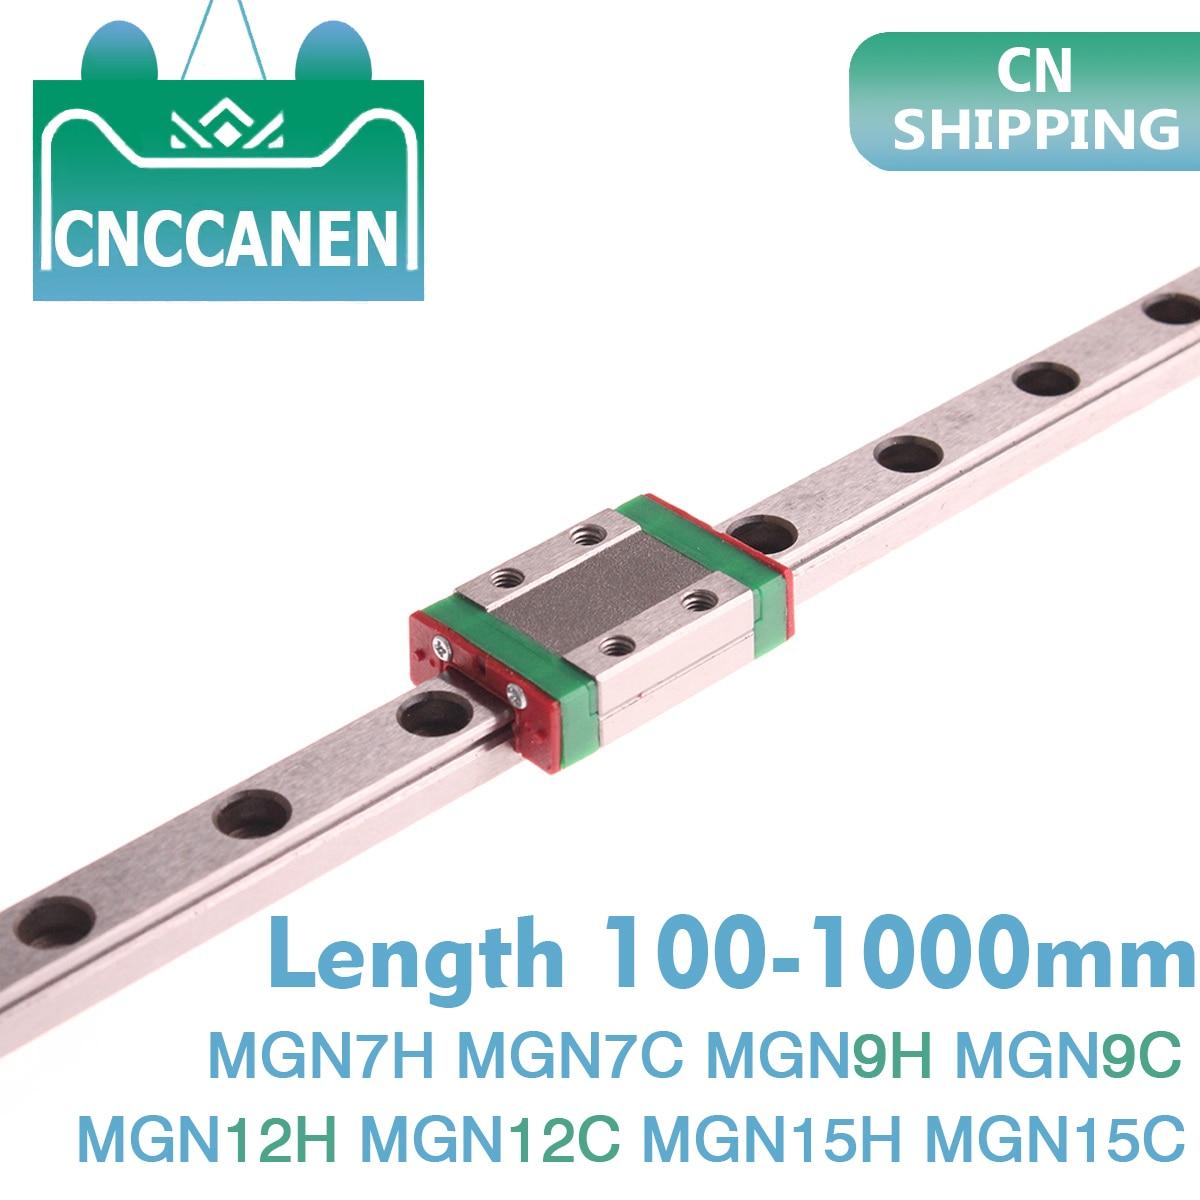 MGN7 MGN9 MGN12 MGN15 100 - 1000mm Miniature Linear Rail Slide 1pc MGN Linear Guide +1pc MGN9H or MGN9C Carriage 3D Printer CNC